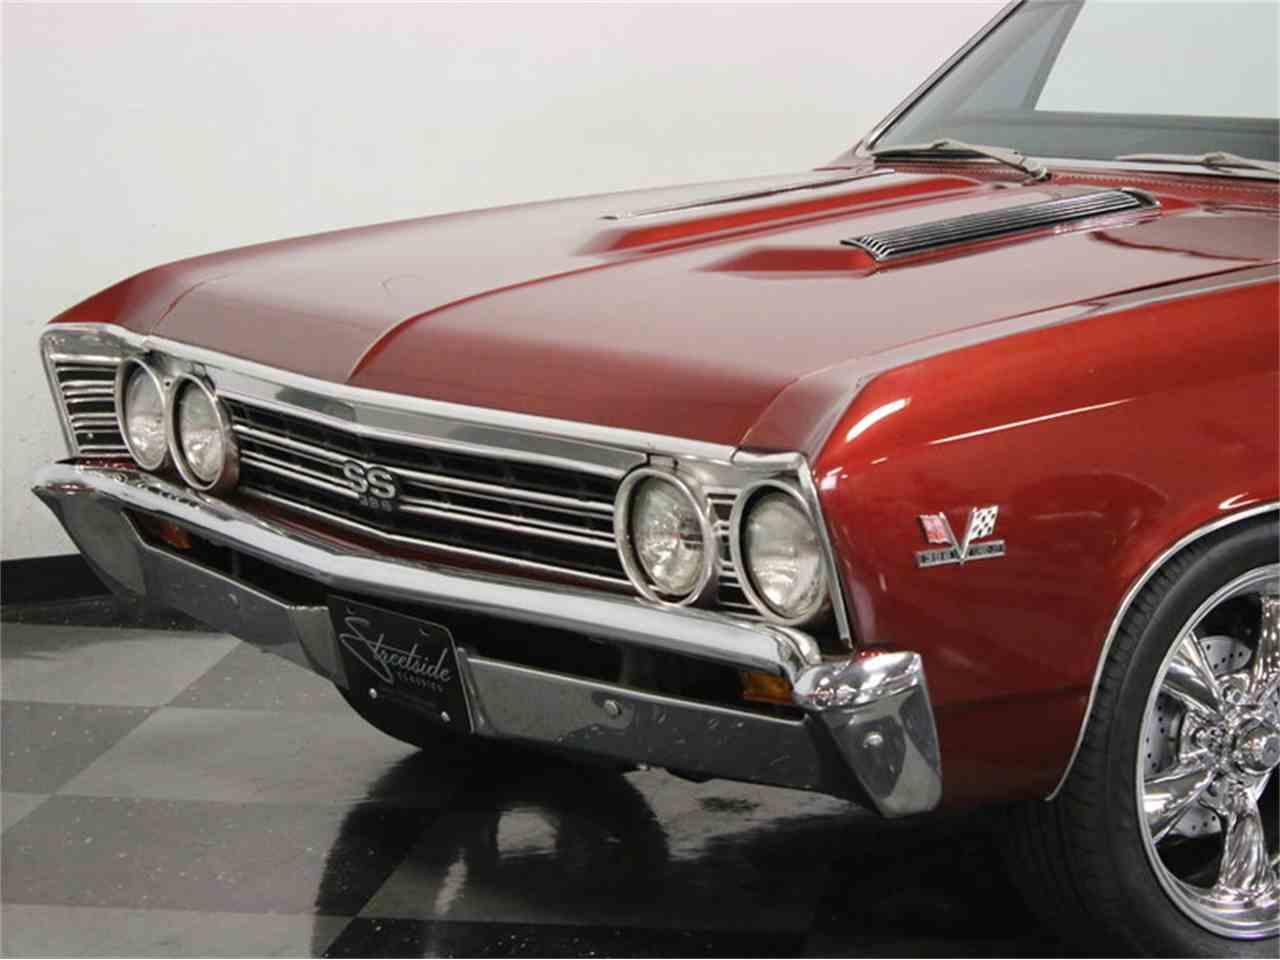 1967 Chevrolet Chevelle SS for Sale | ClassicCars.com | CC-1008934